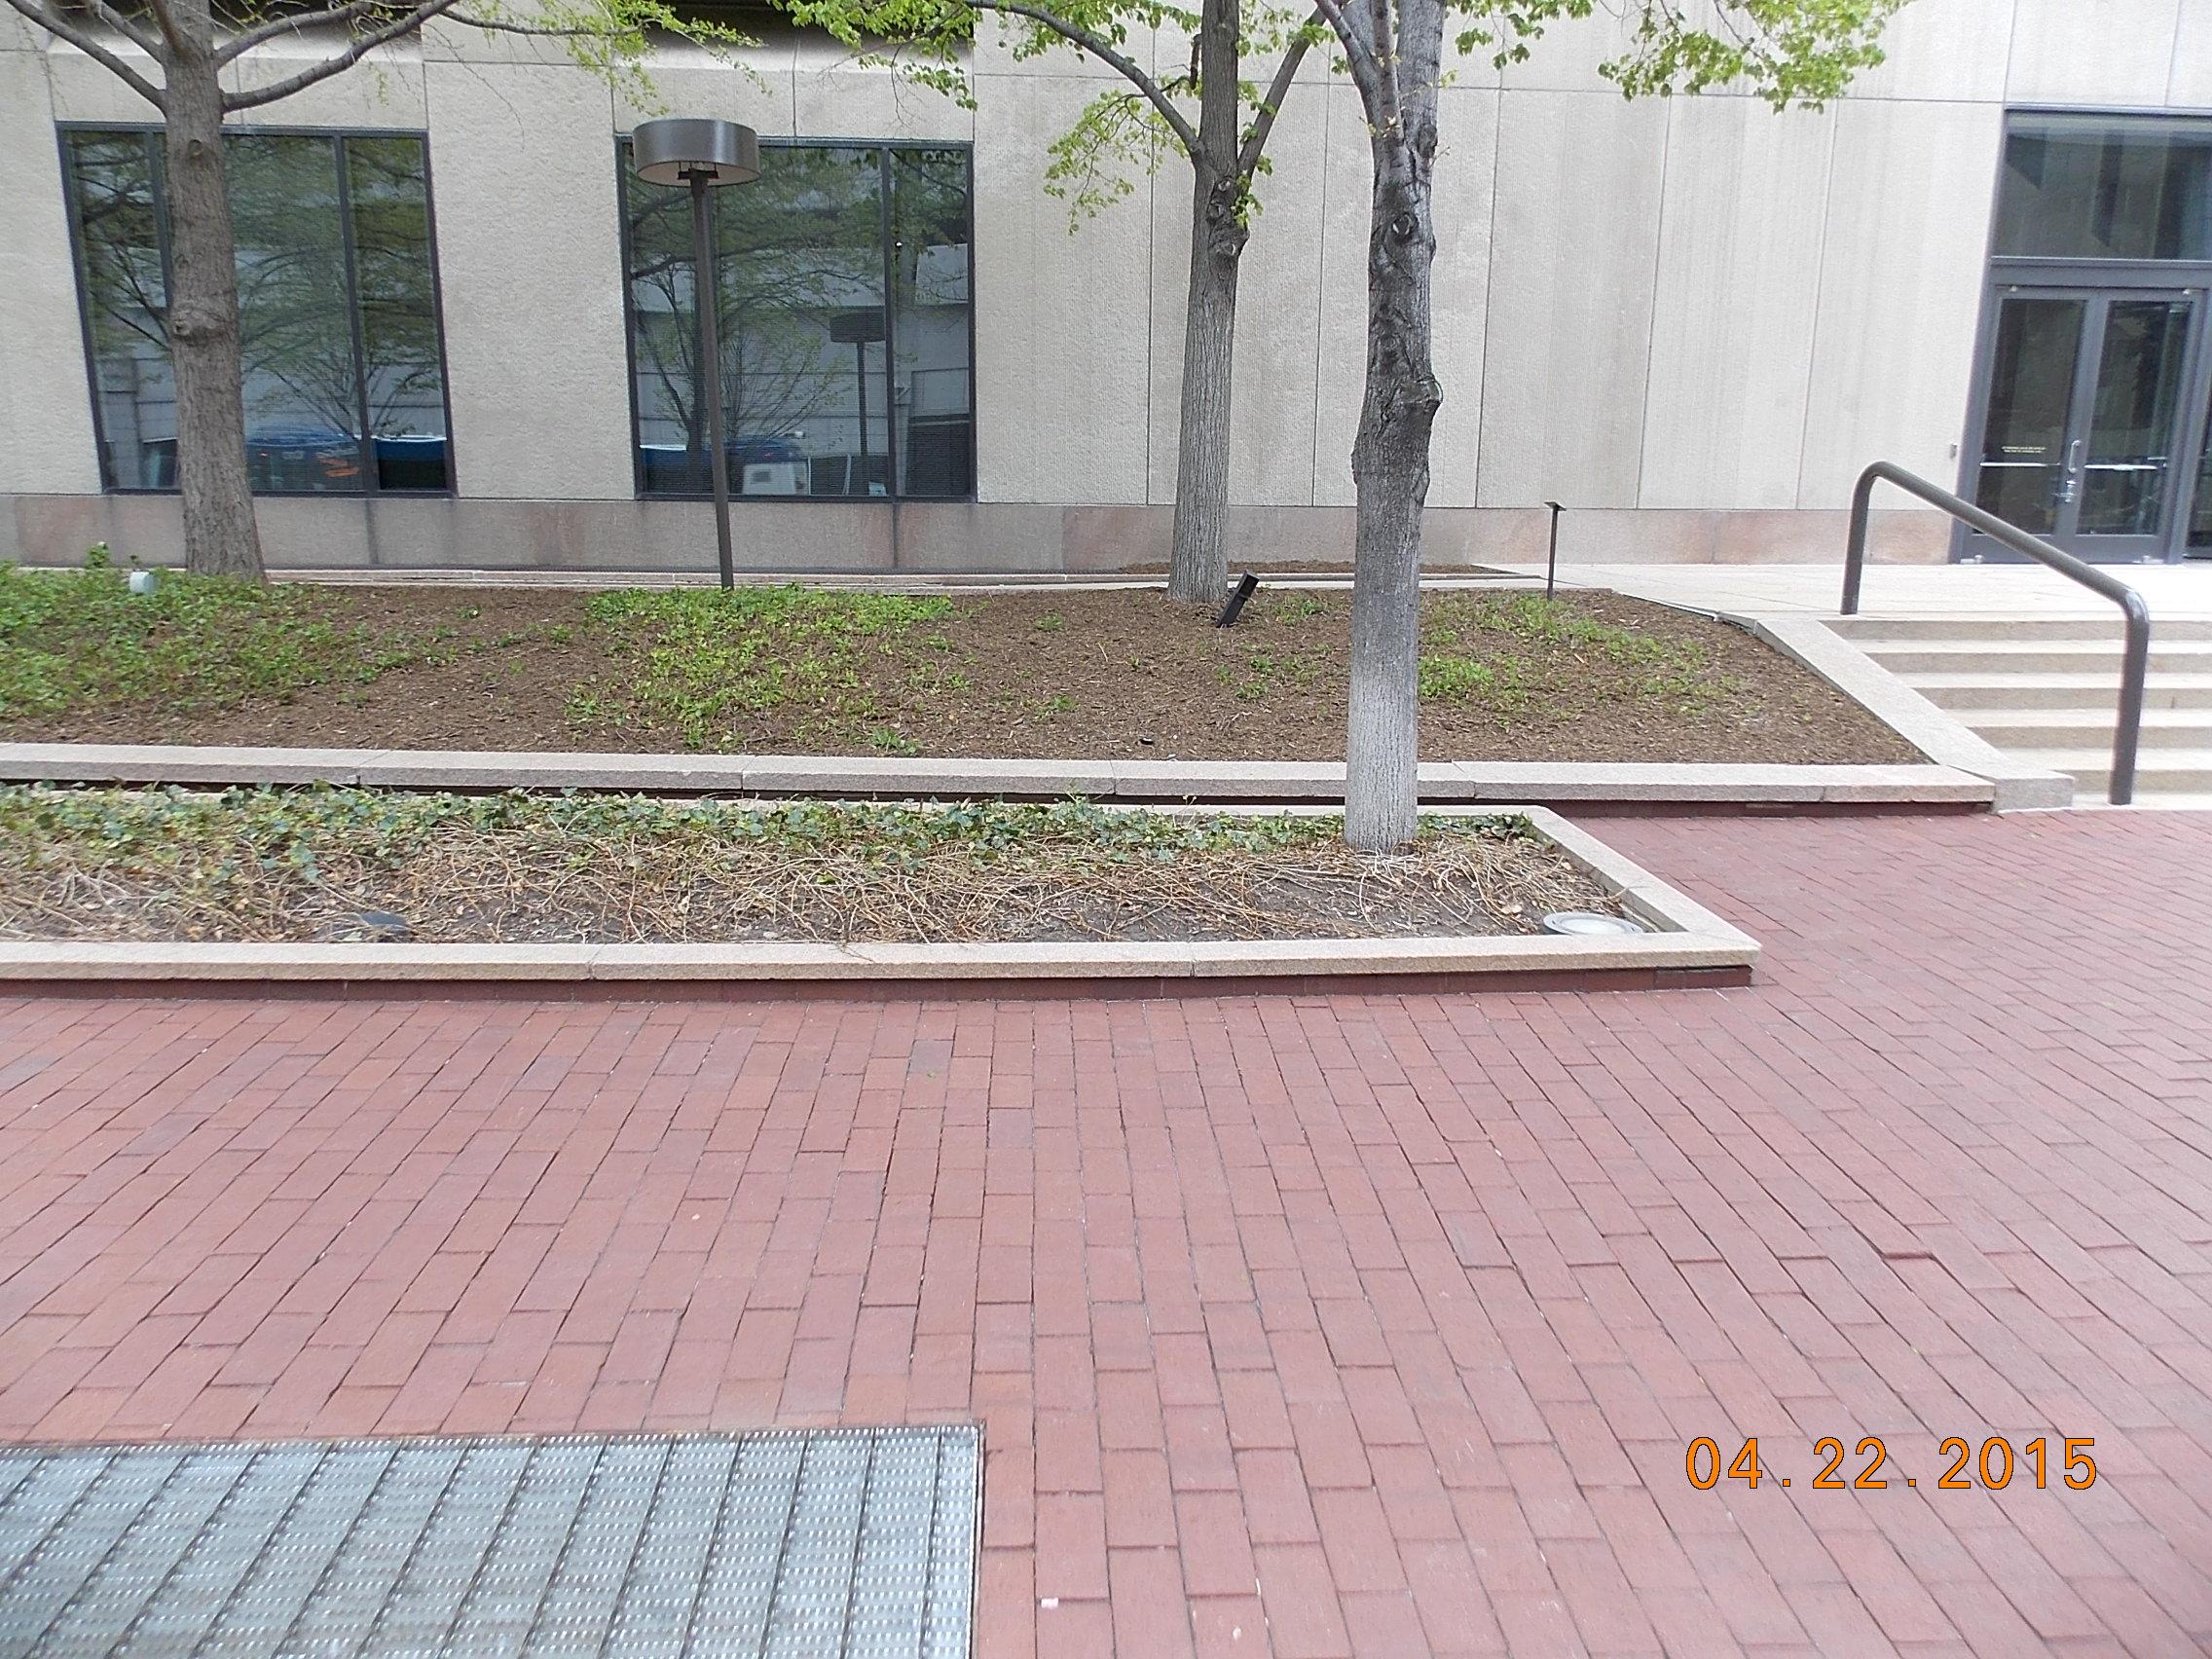 Initial sidewalk-planter configuration